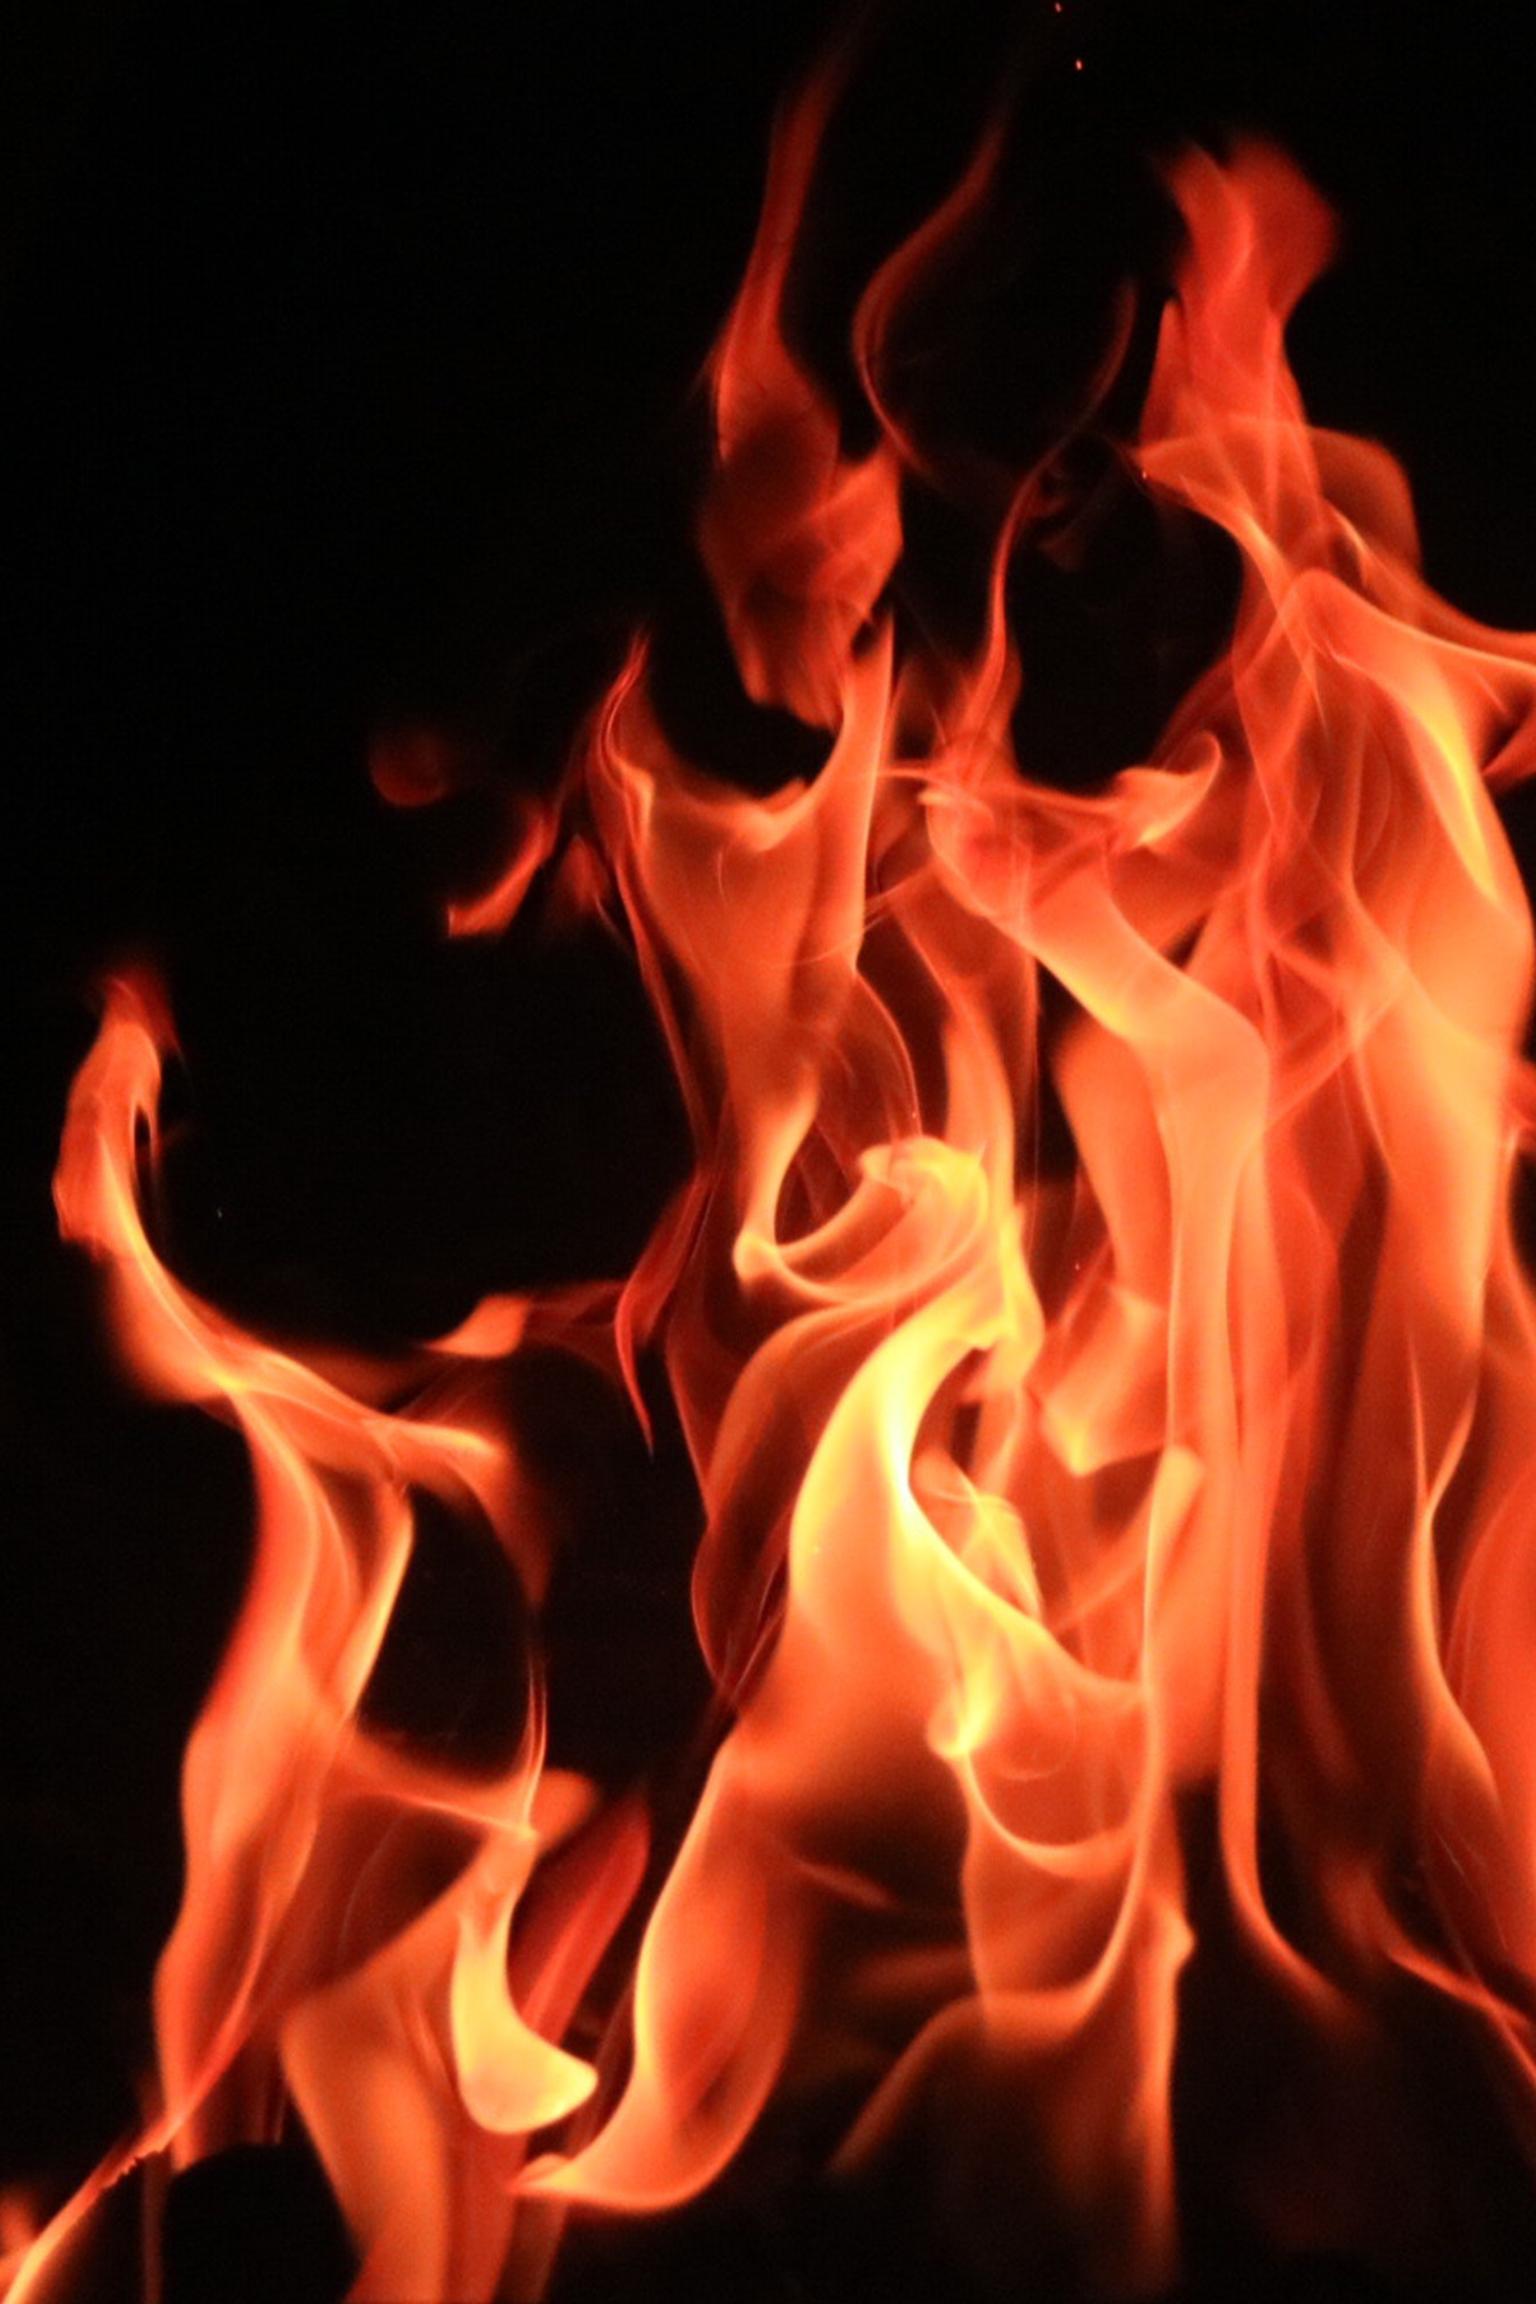 combustible-dust-flash-fire-hazard.jpg